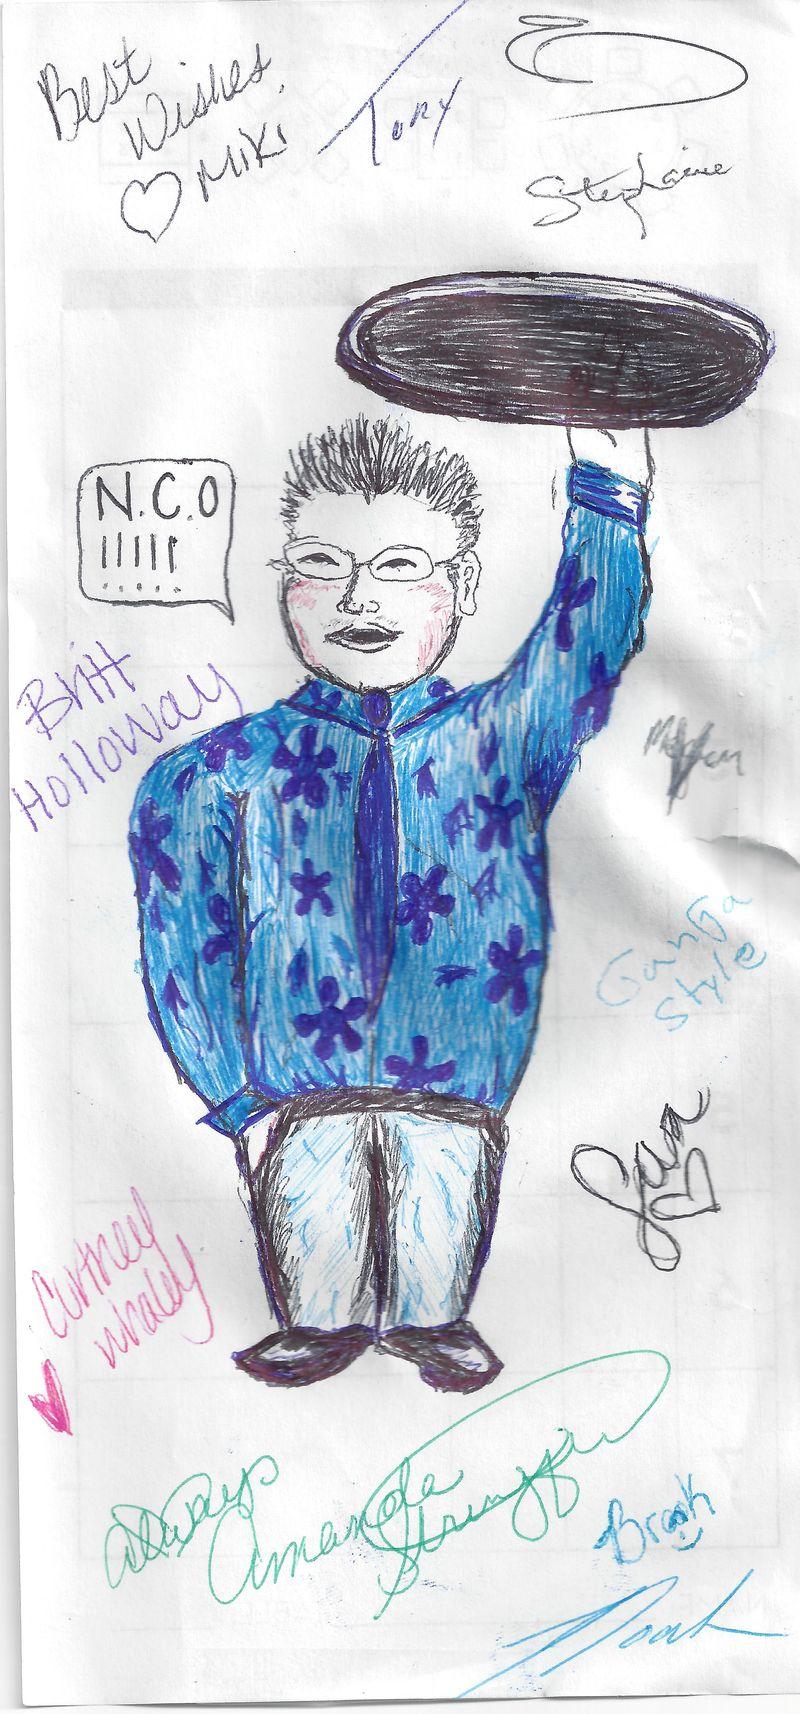 Nicholas by Noah 1-8-2014